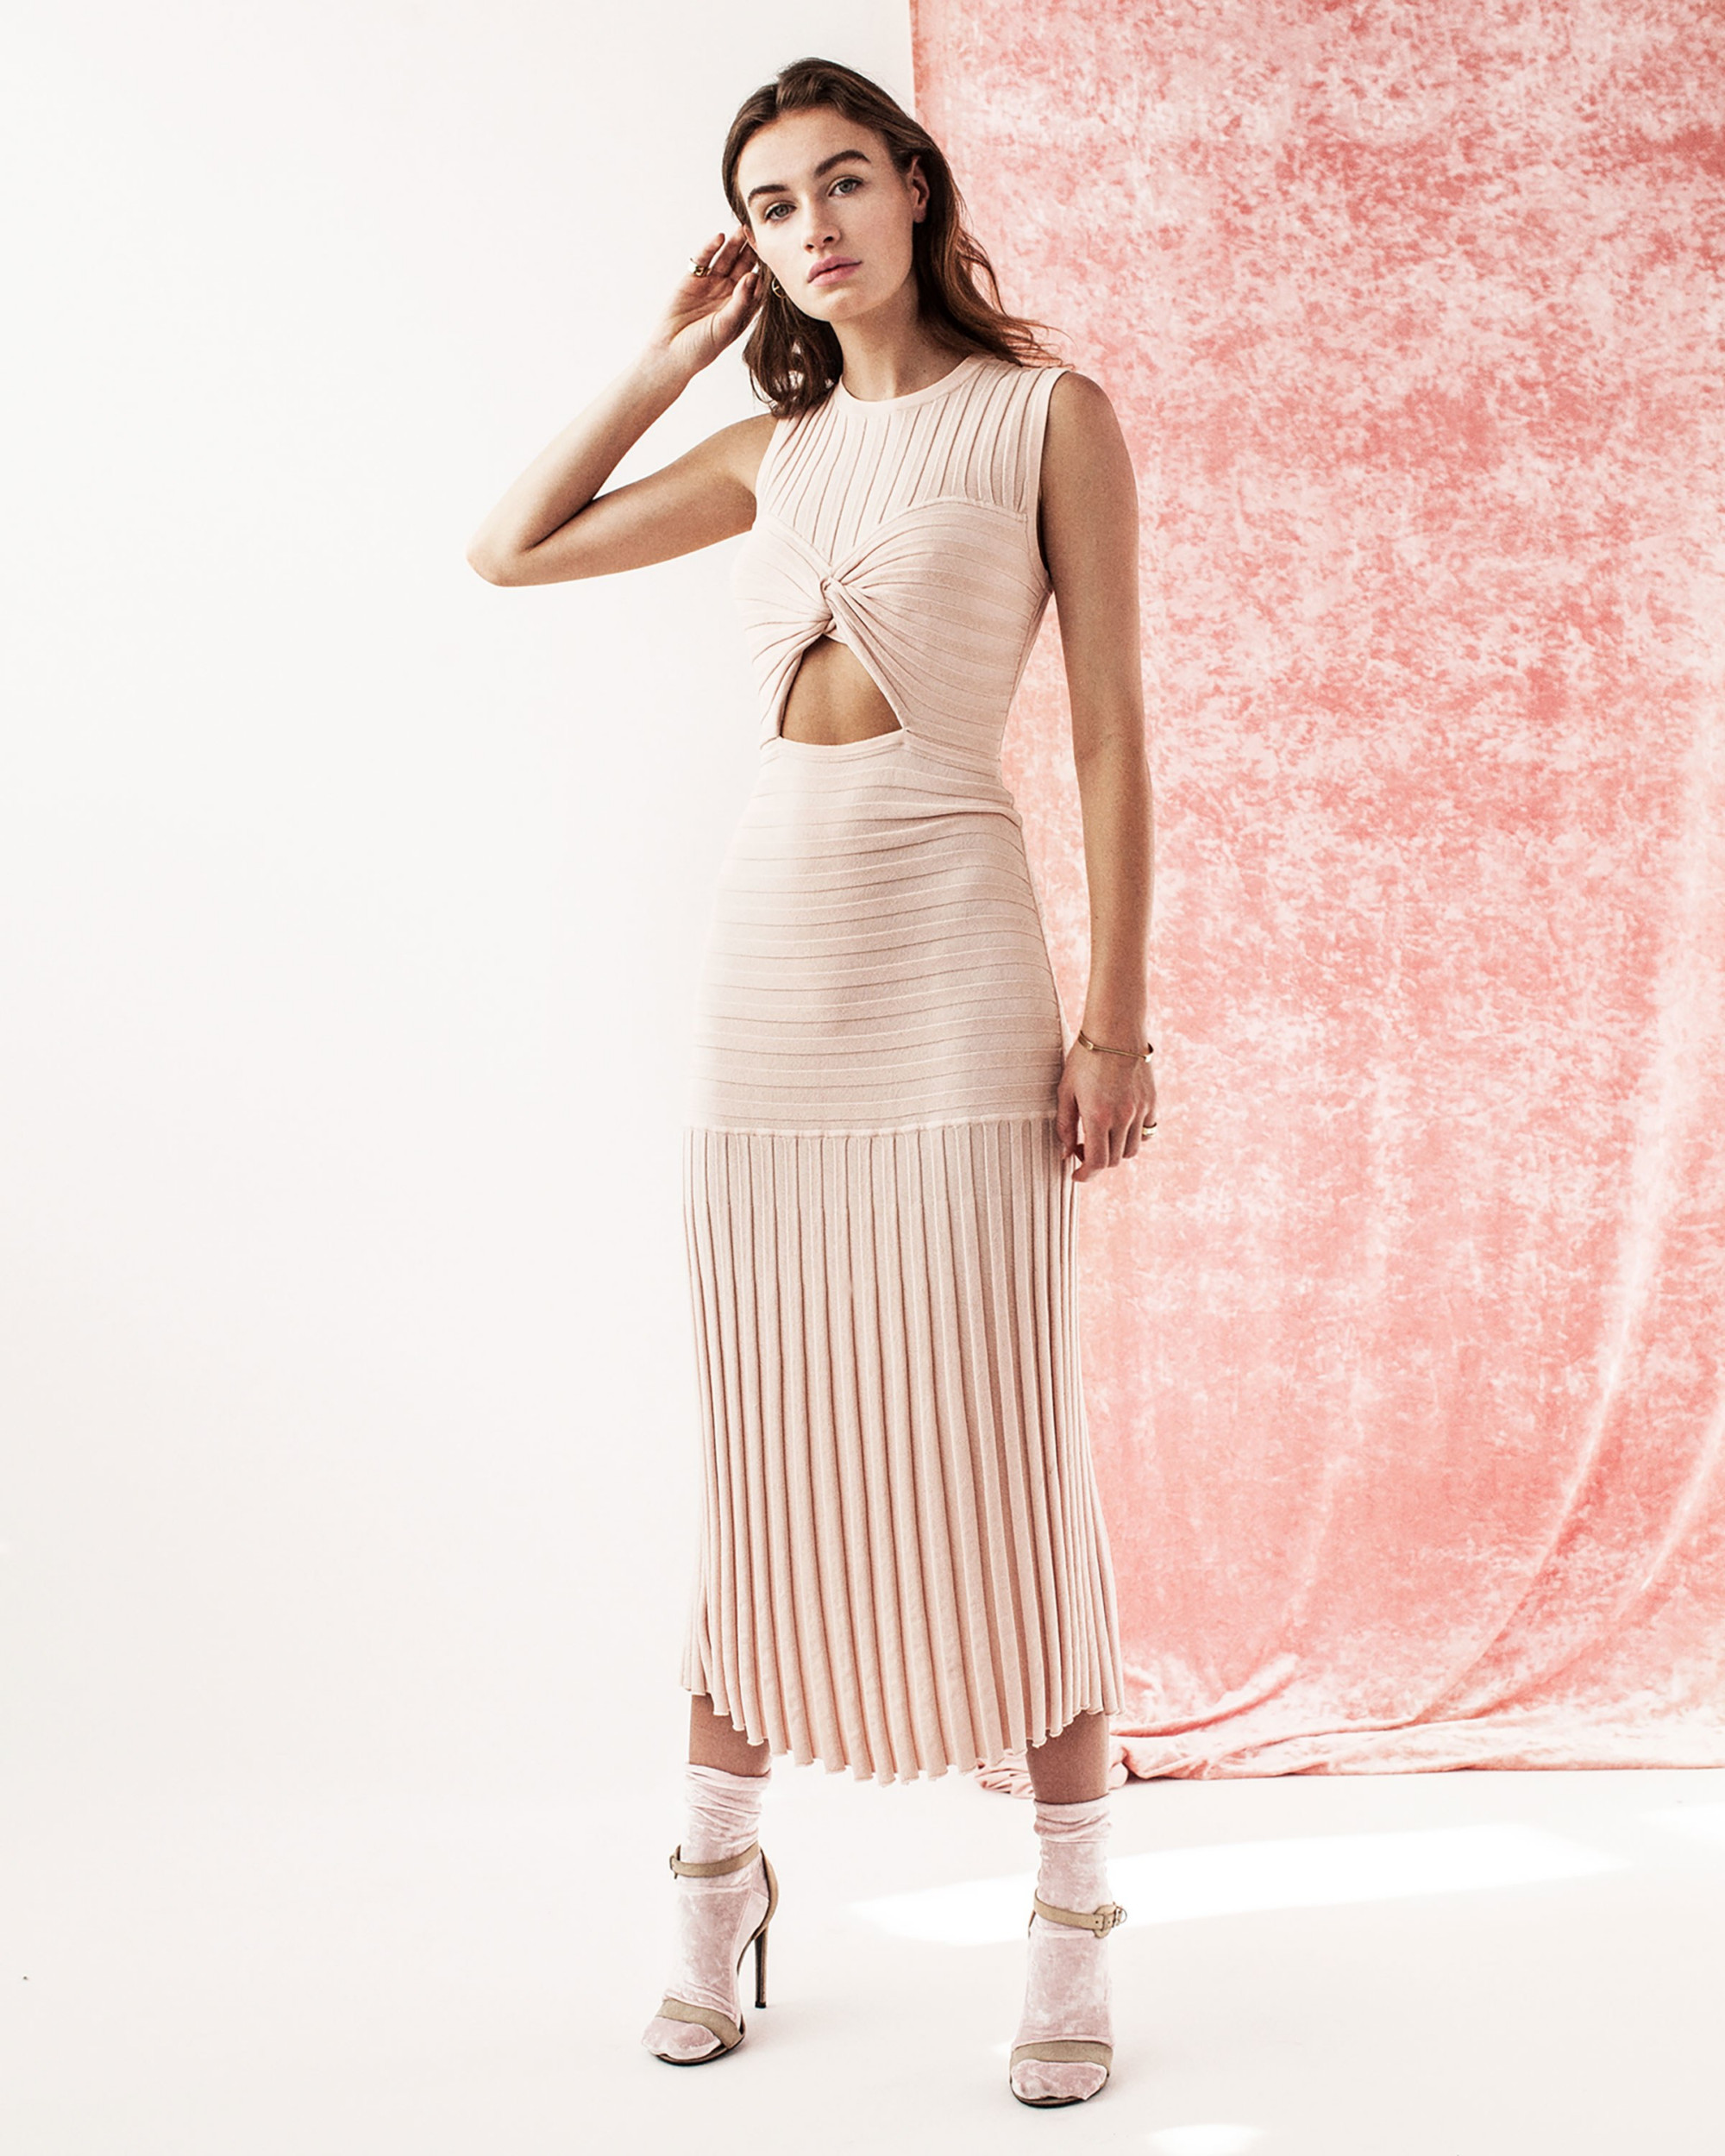 Tabula Rasa светло-бежевое платье с вырезом на талии 2018-2019